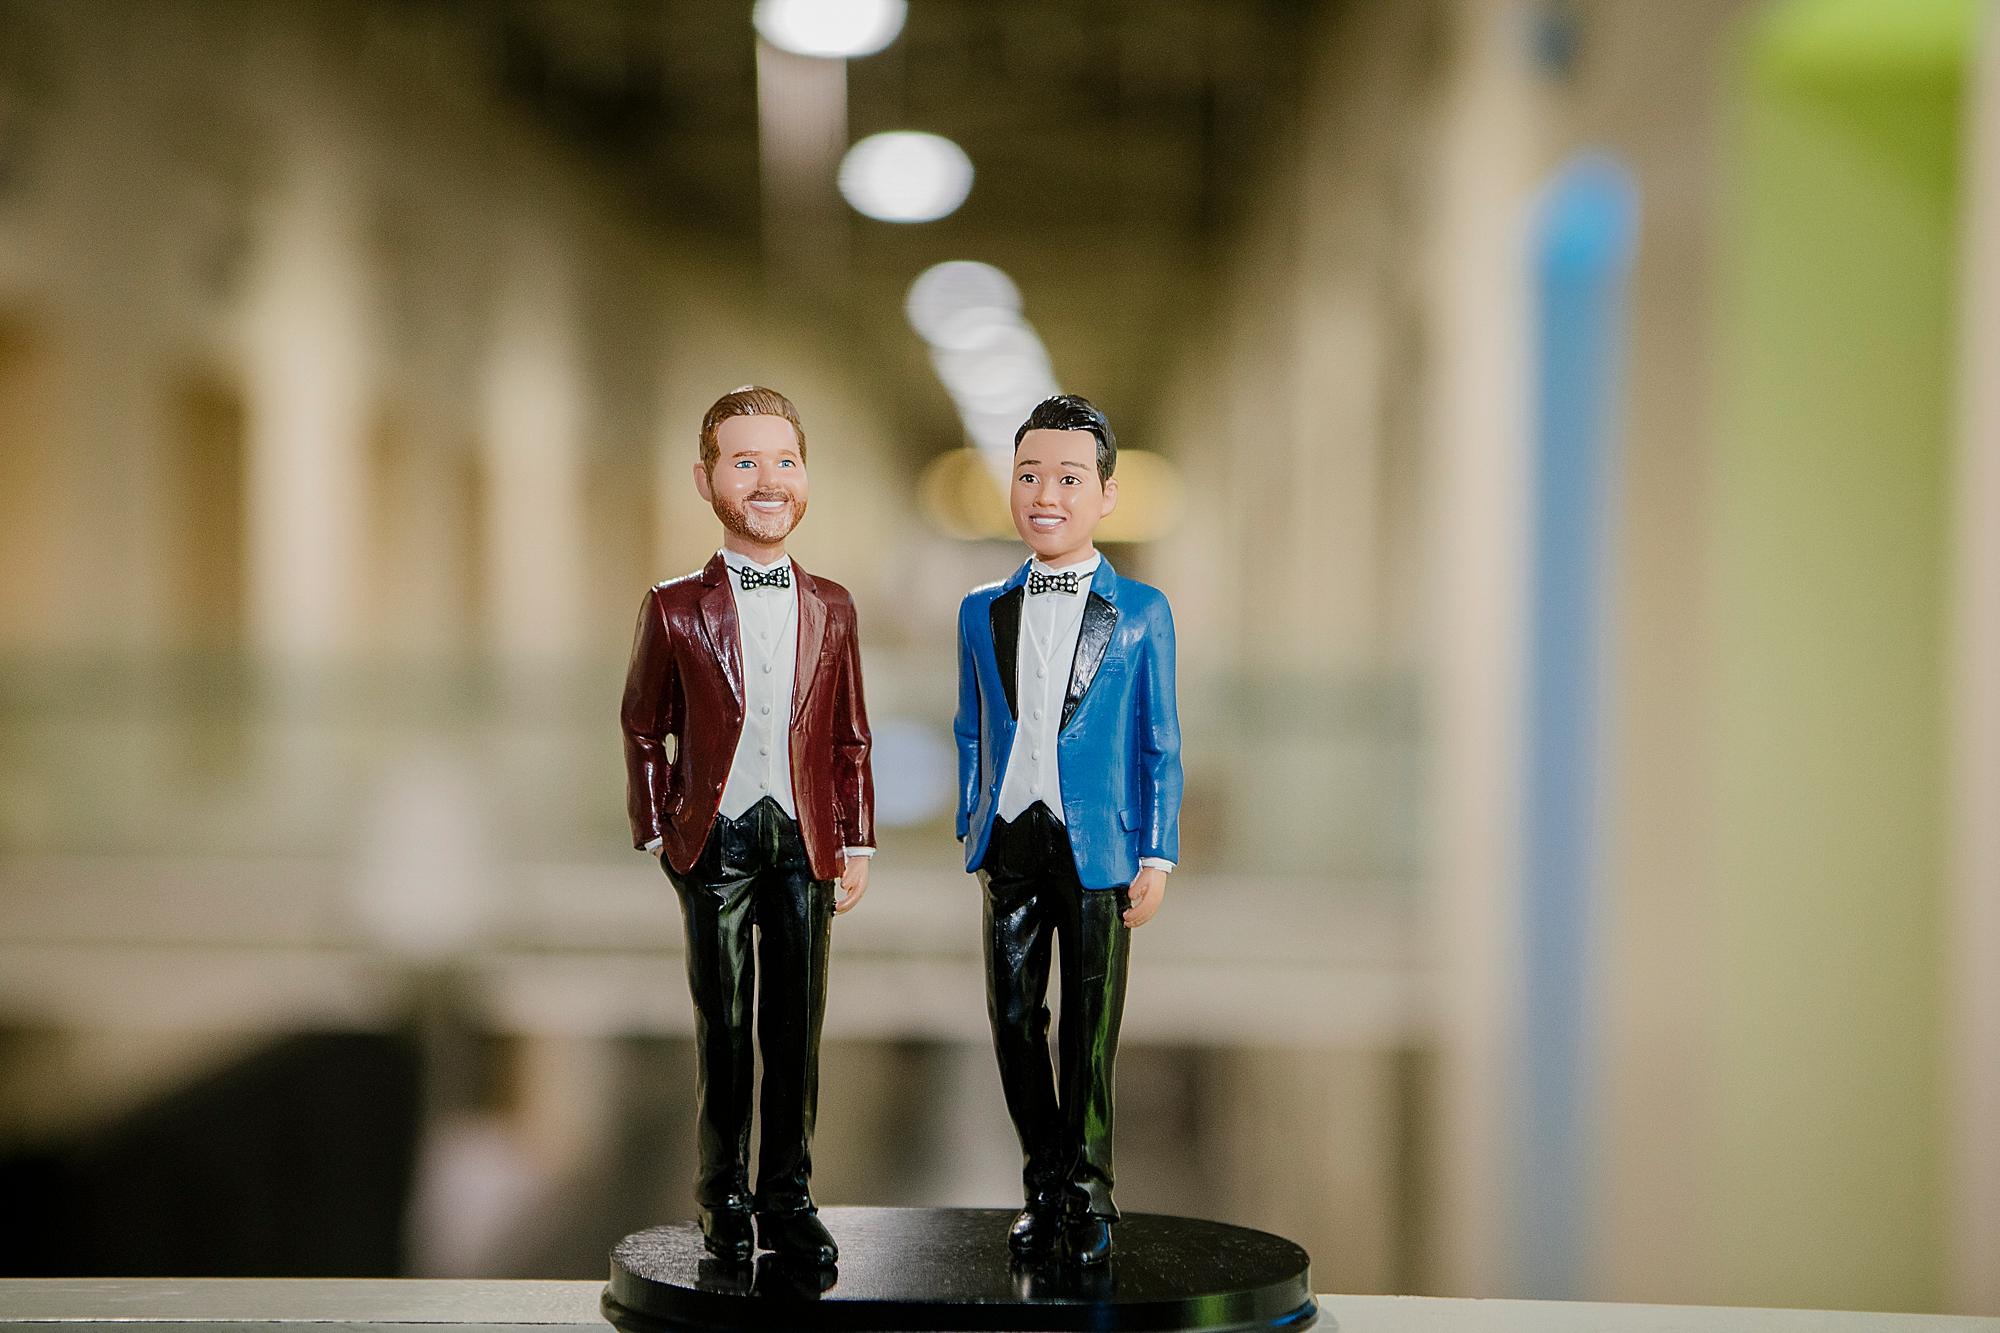 Dan_and_Byron_Love_by_Joe_Mac_Philadelphia_Wedding_LGBTQ_Photography_Gay_Independence_visitor_Center_142.JPG